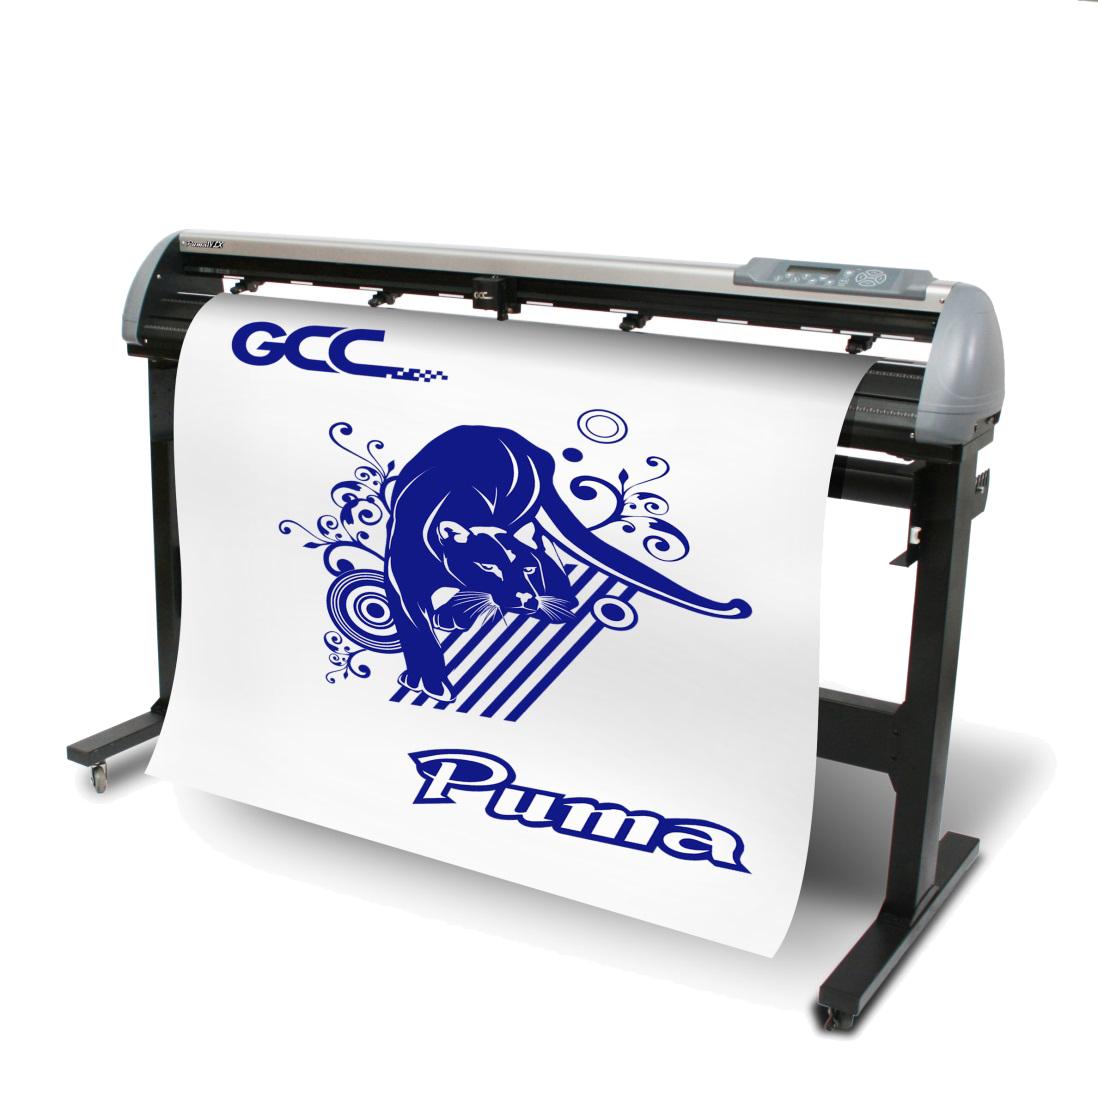 GCC Puma IV Cutter • Canadian Sign Suppliers Vinyl cutter